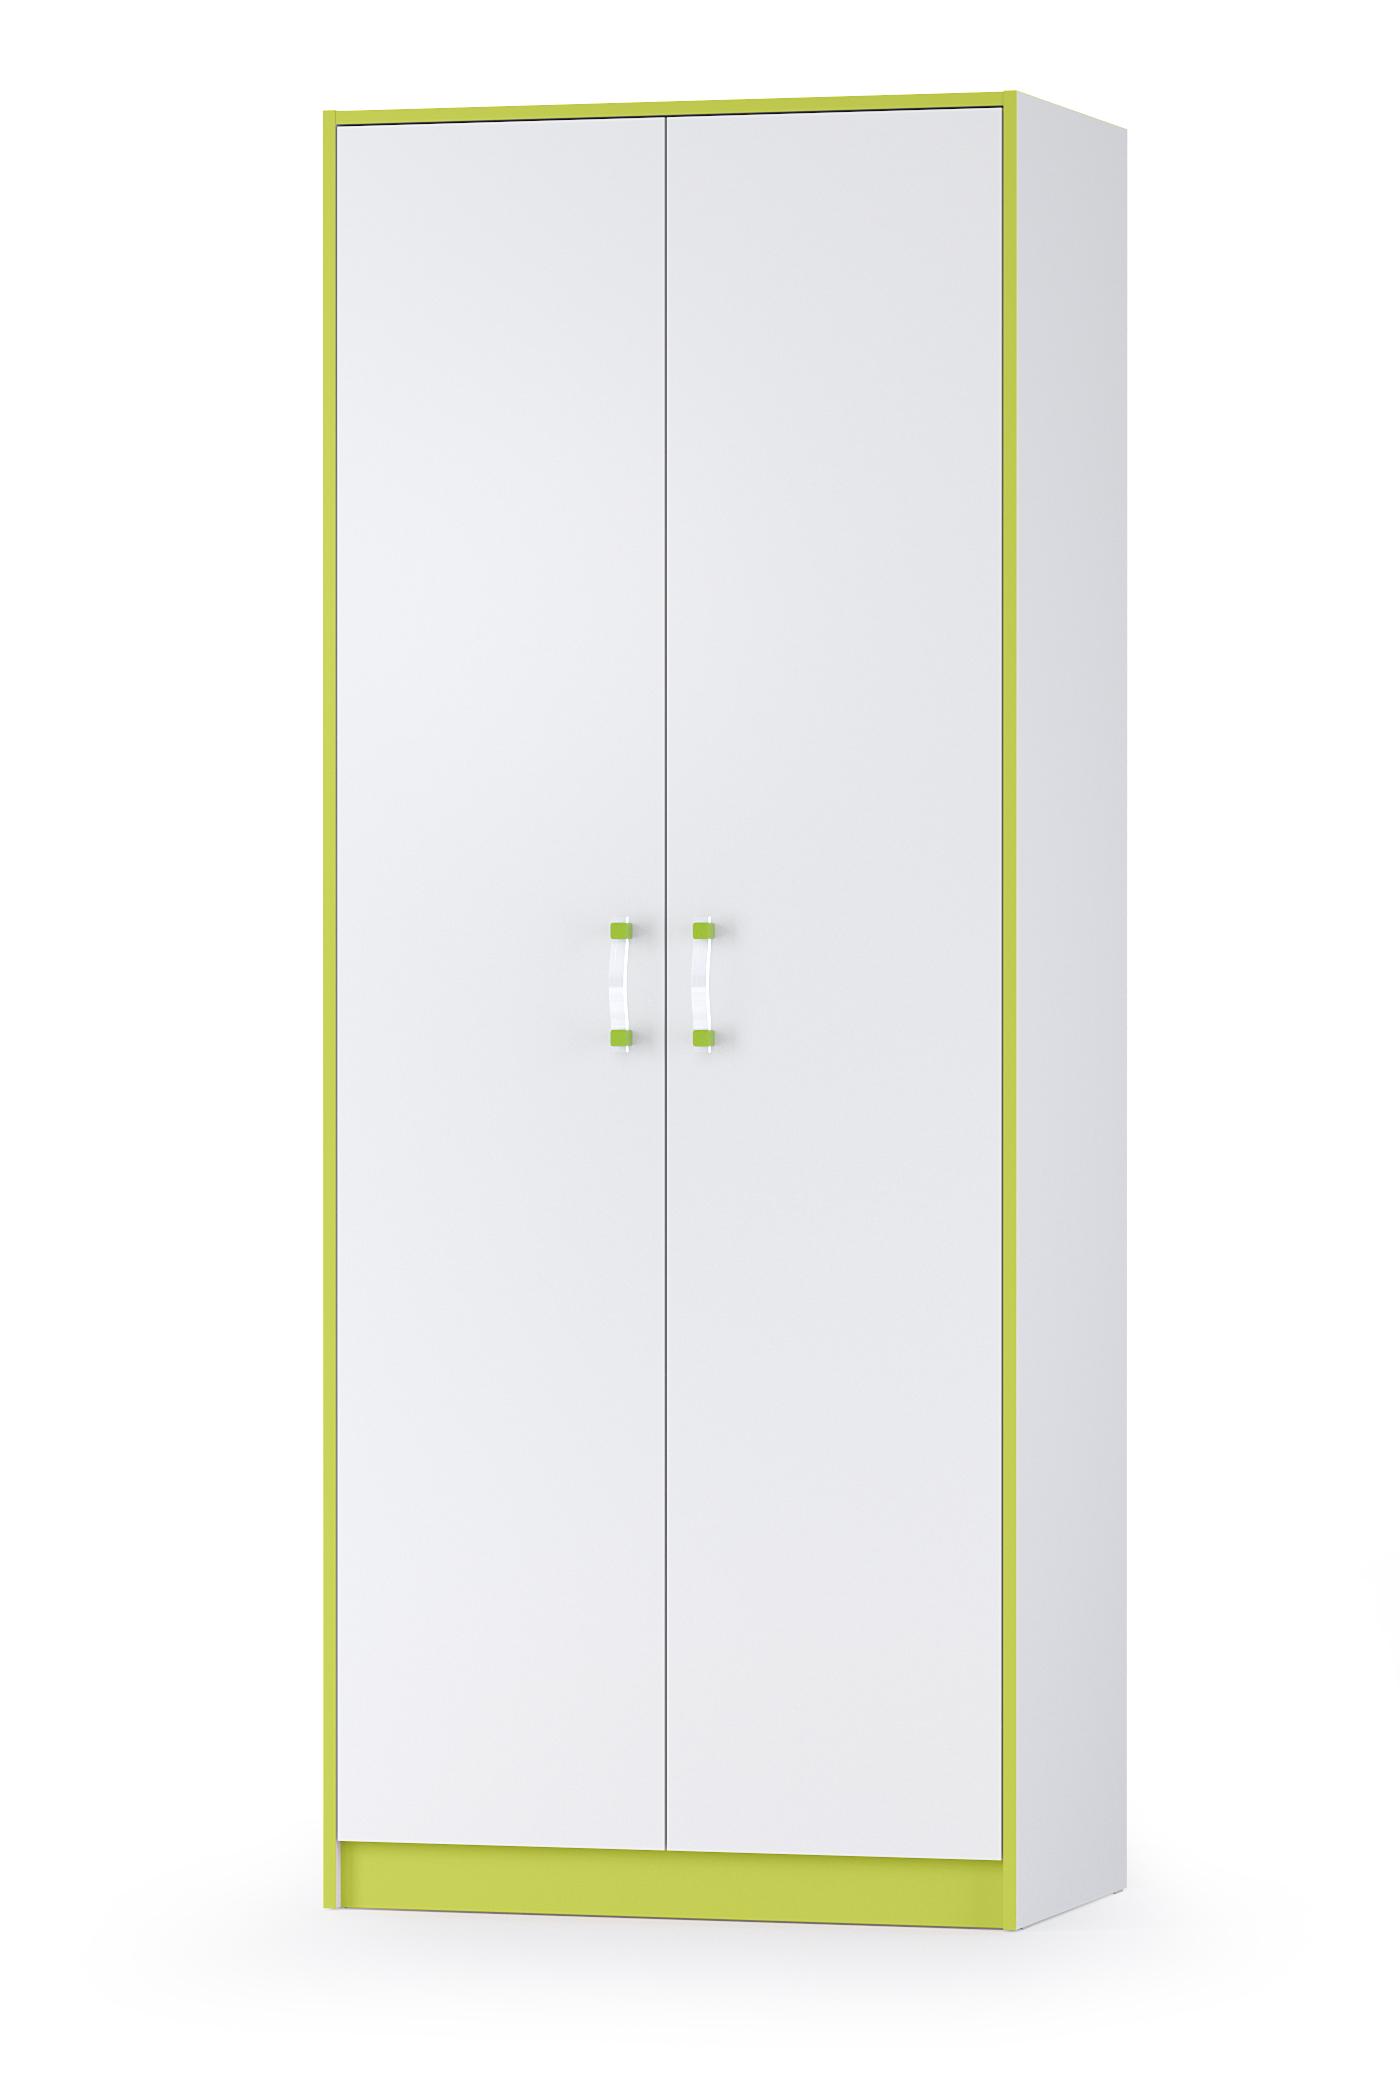 Шкаф двухдверный Mobi Альфа 13.42 лайм зеленый/белый премиум, 87х53х218 см